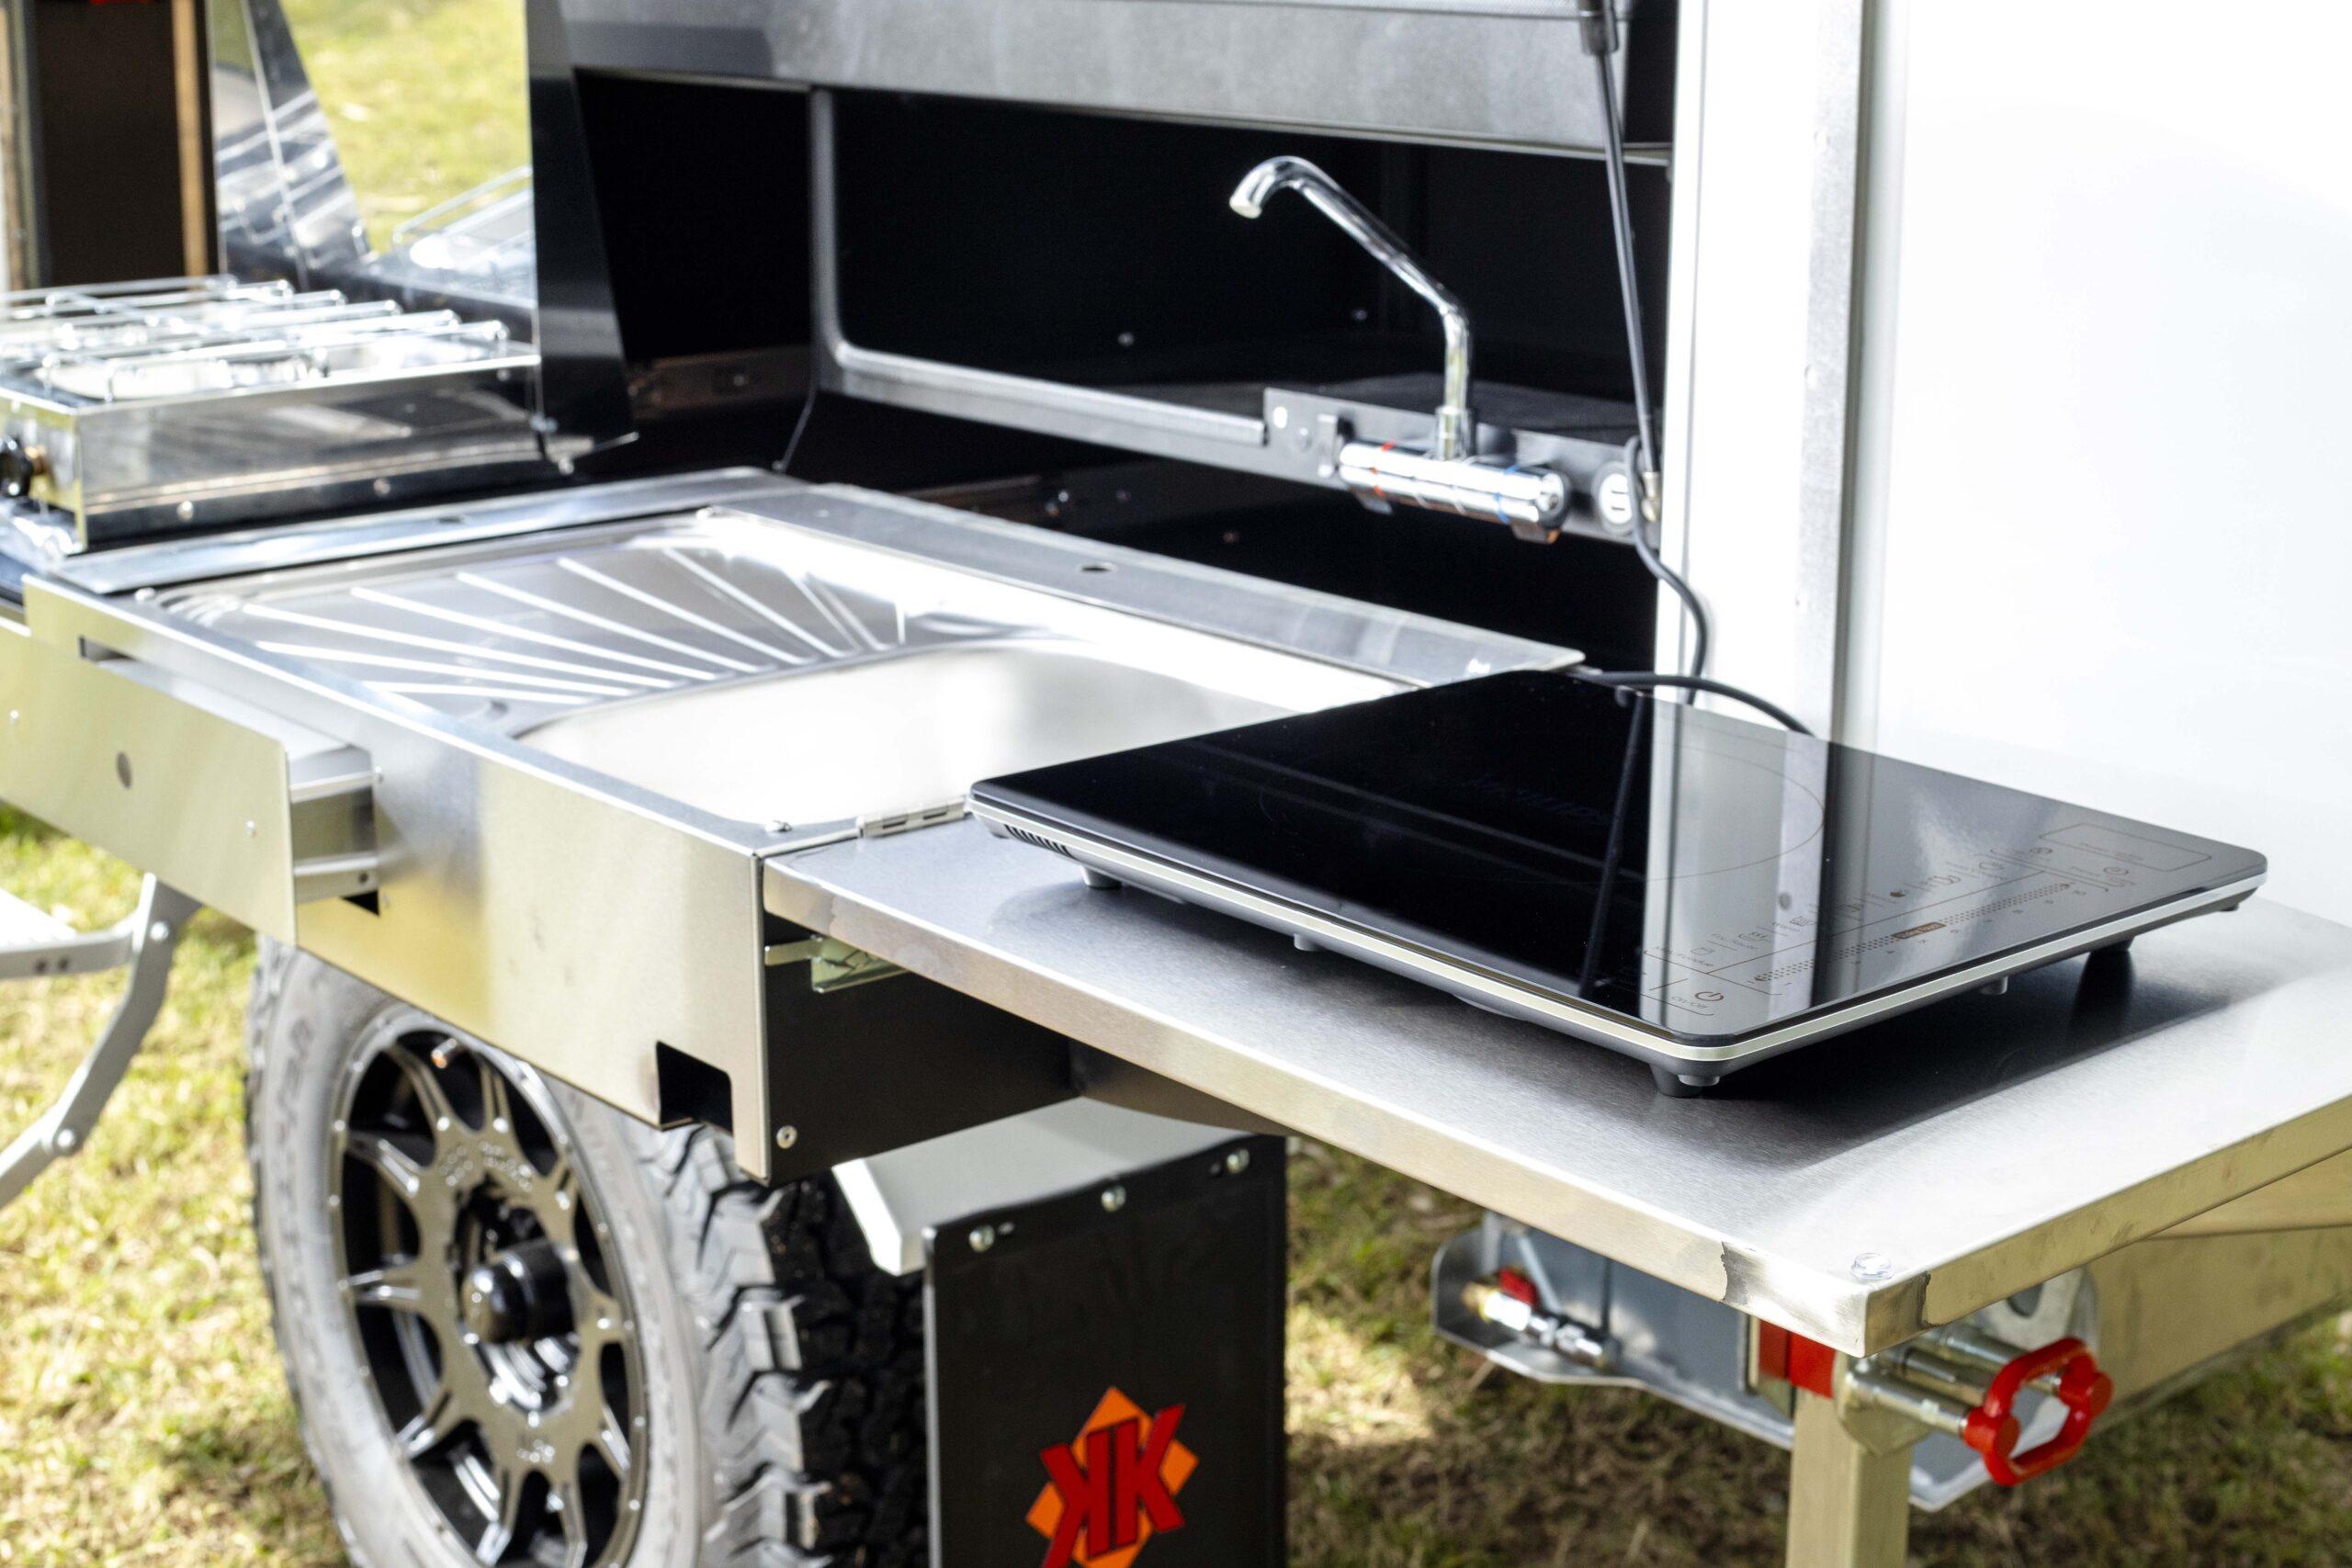 Kimberley Karavan outdoor kitchen portable induction